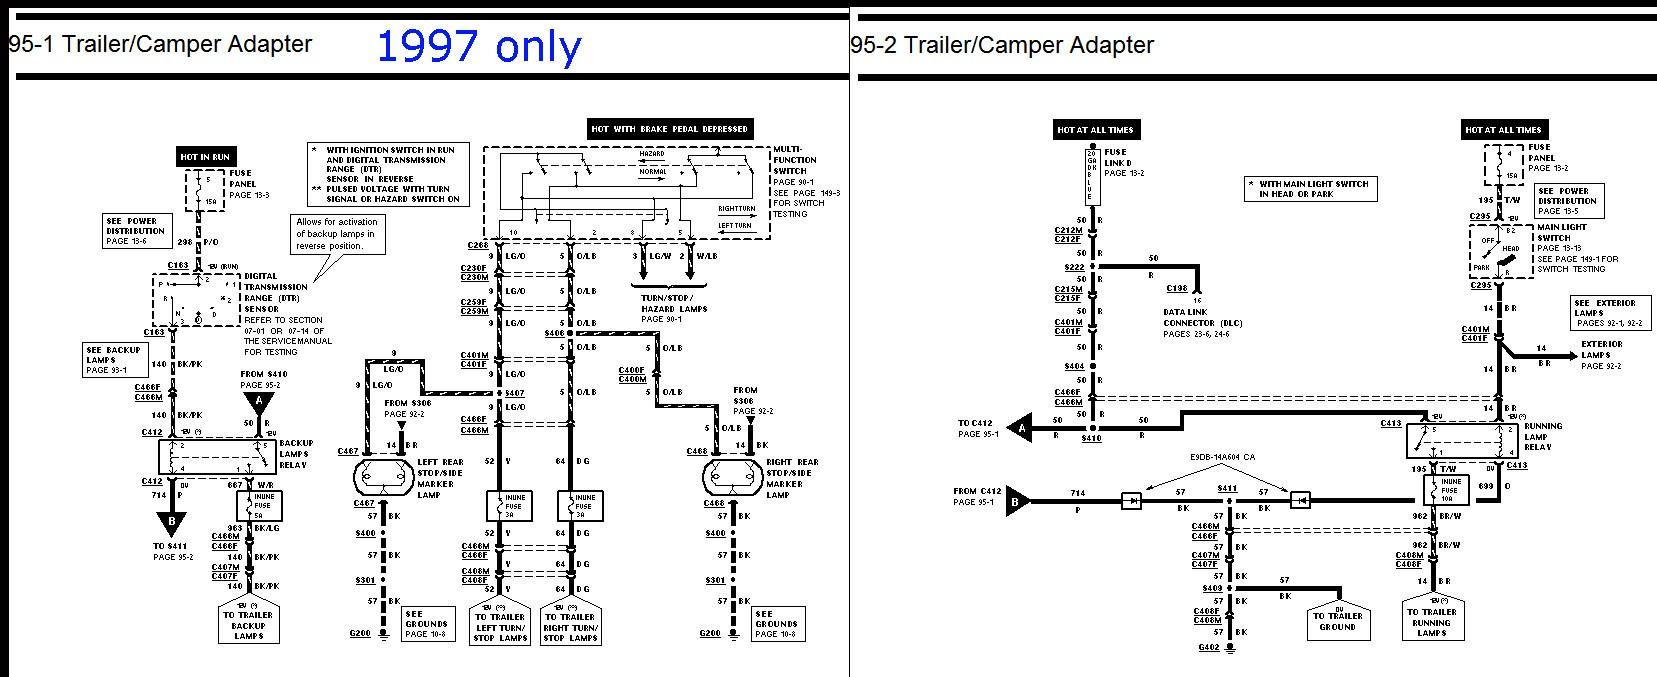 1998 ford f 150 wiring harness diagram hy 3447  1998 ford f 150 wiring diagrams schematic wiring  1998 ford f 150 wiring diagrams